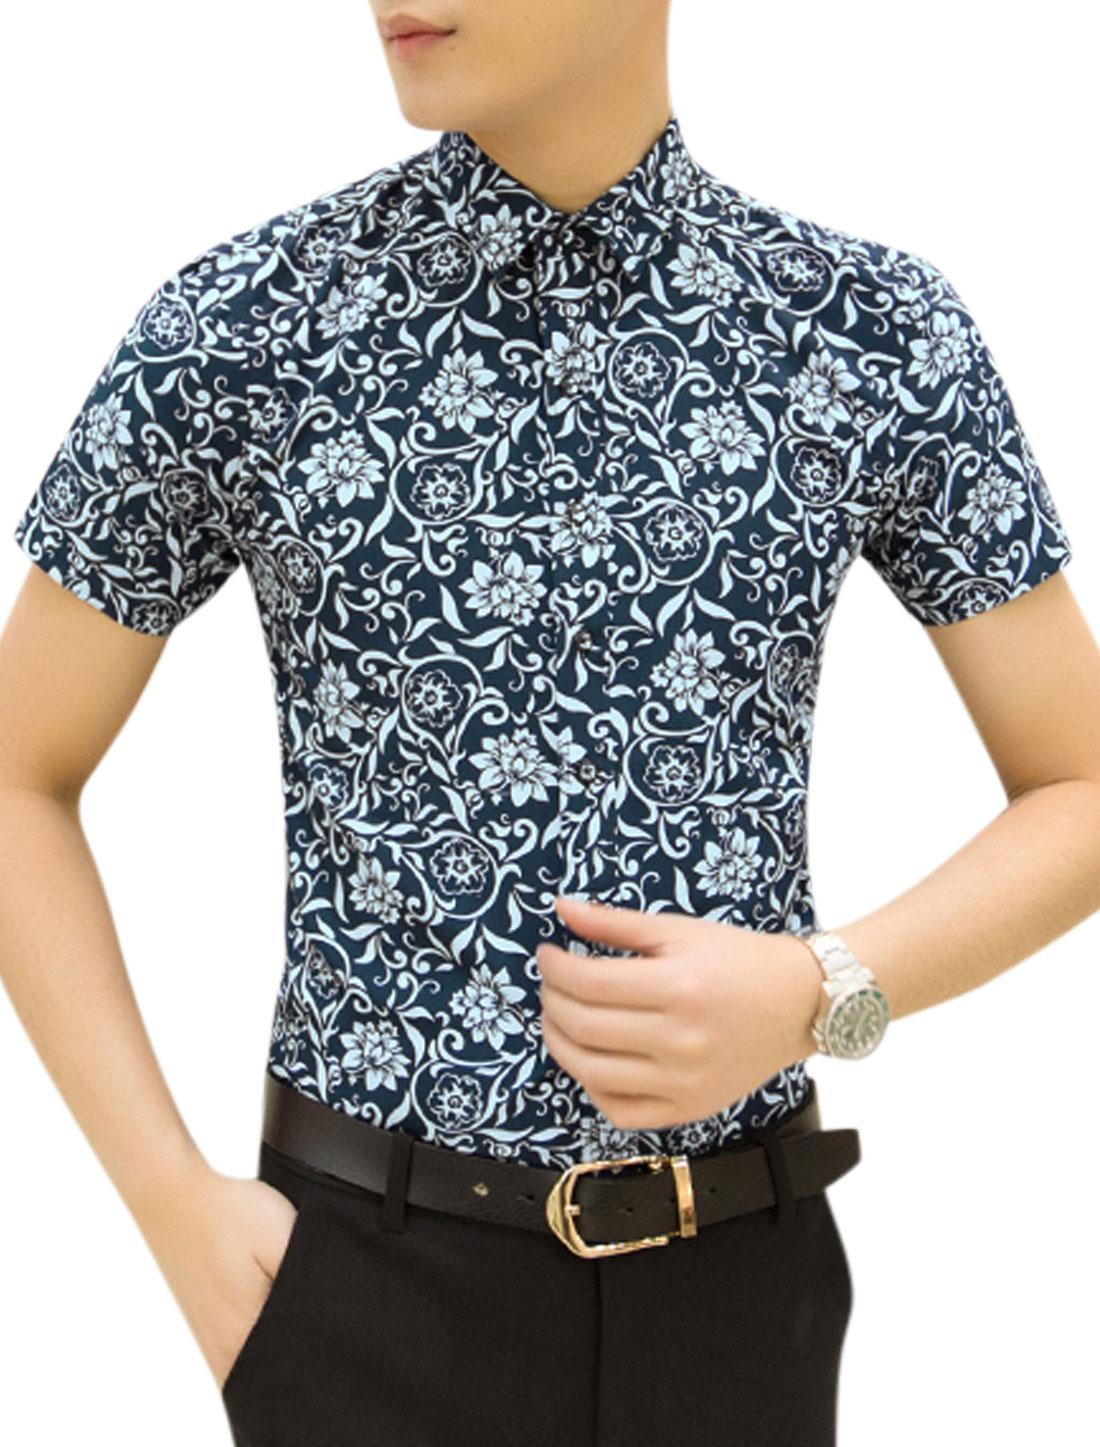 Men Short Sleeves Floral Printed Casual Tops Navy Blue M